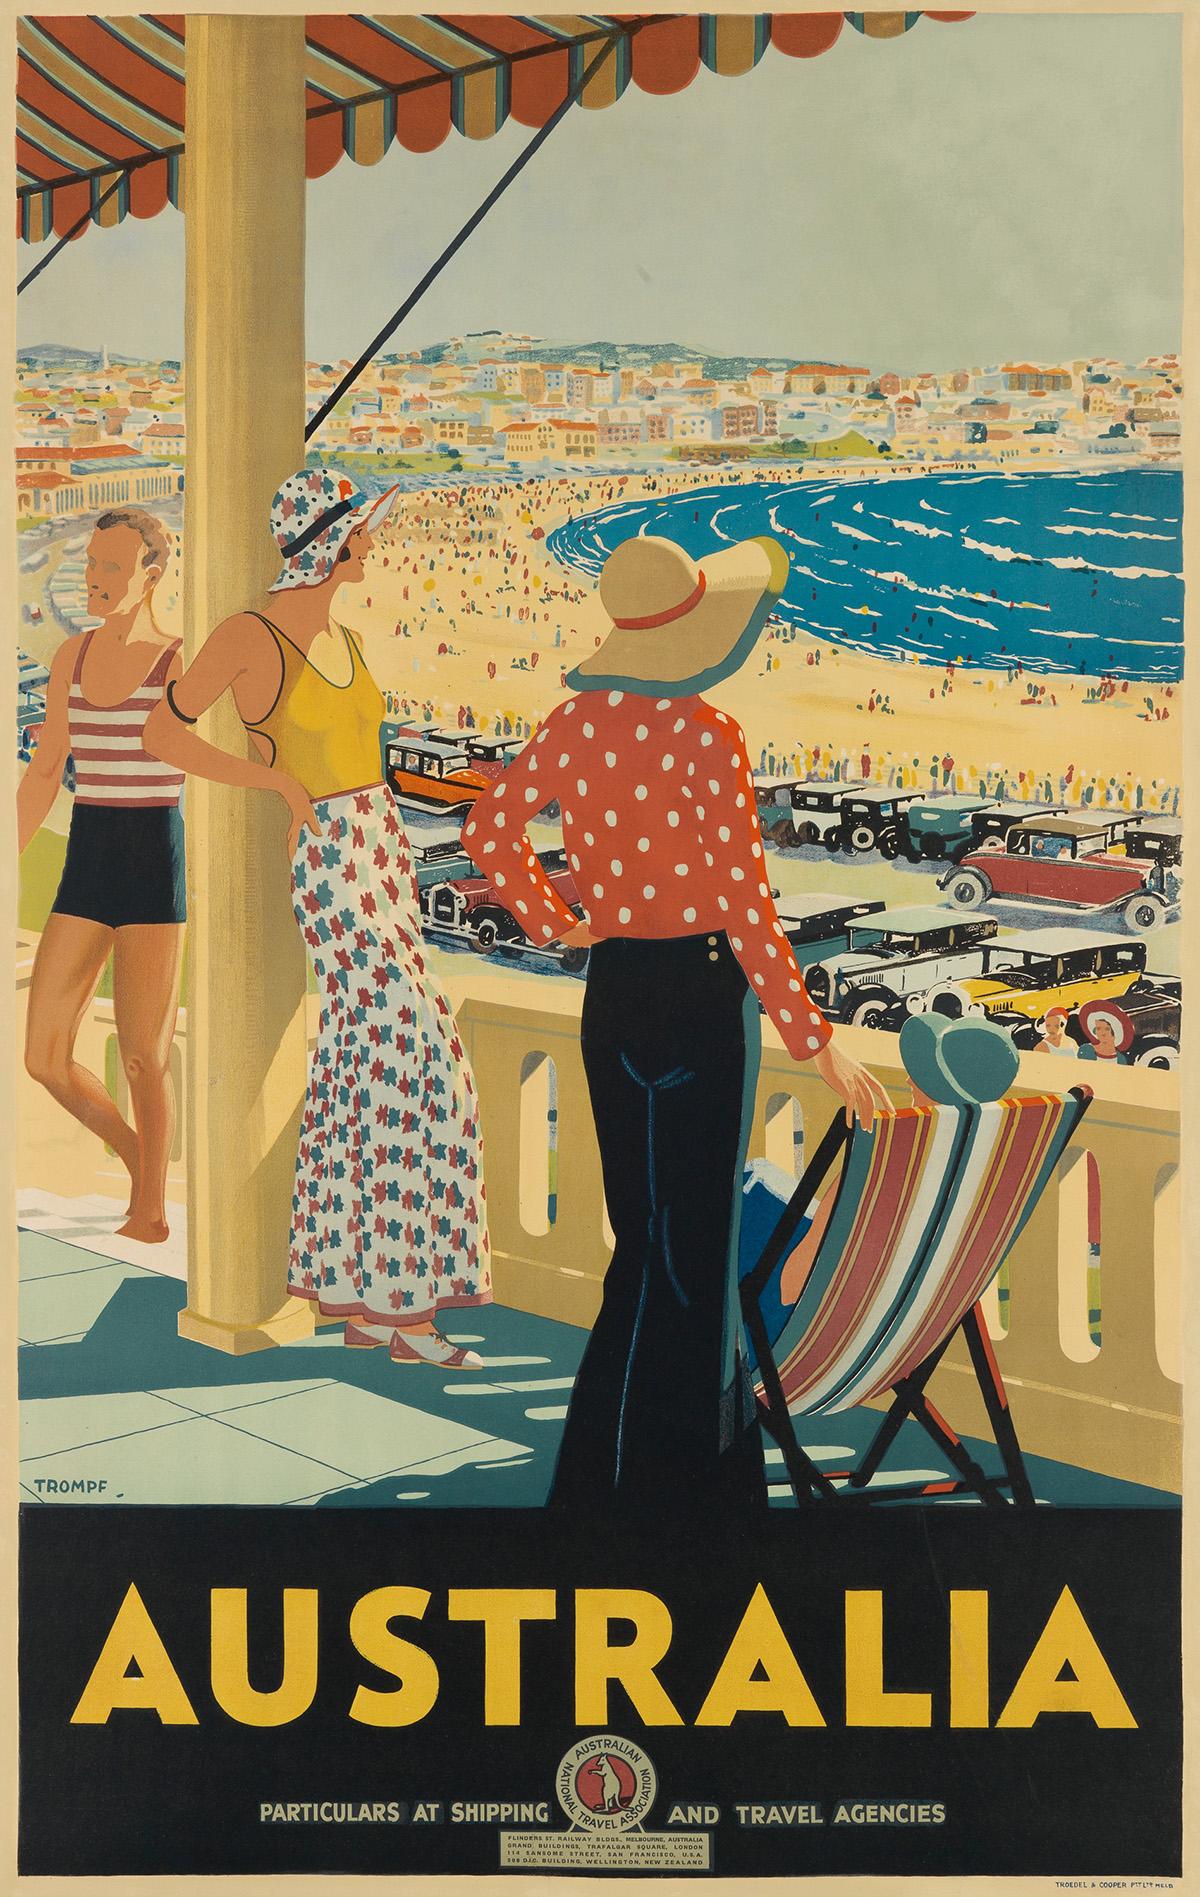 PERCIVAL-(PERCY)-ALBERT-TROMPF-(1902-1964)-AUSTRALIA-1929-39